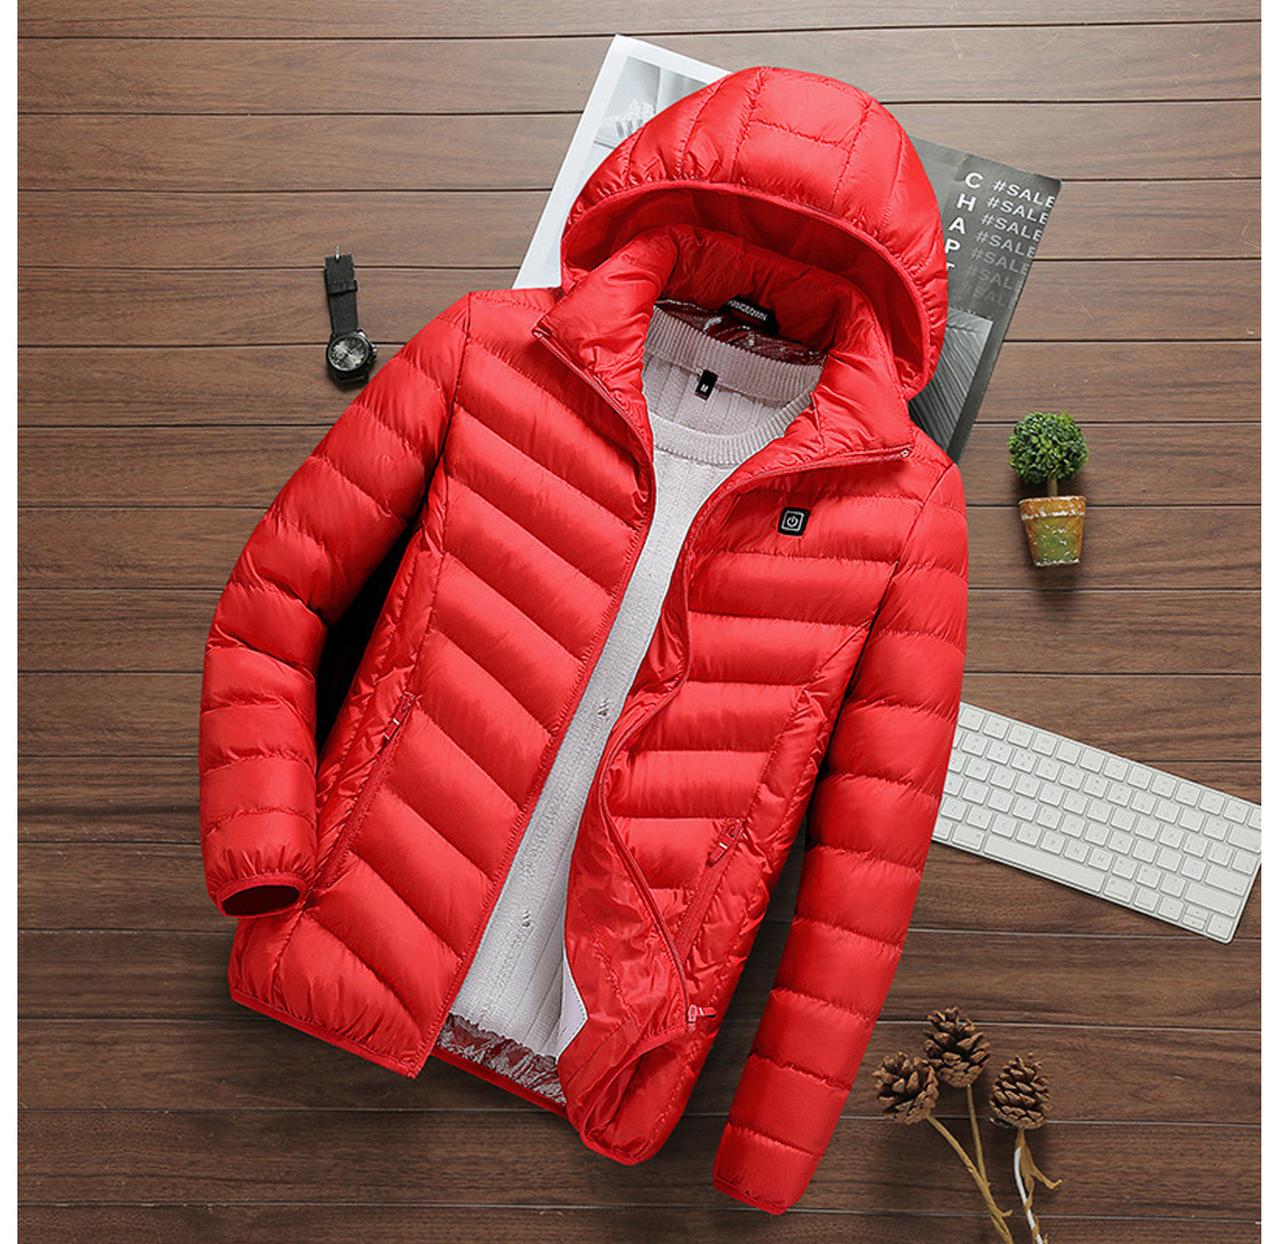 Caldo Insulated Heated Puffer Jacket $49.99 (80% OFF)